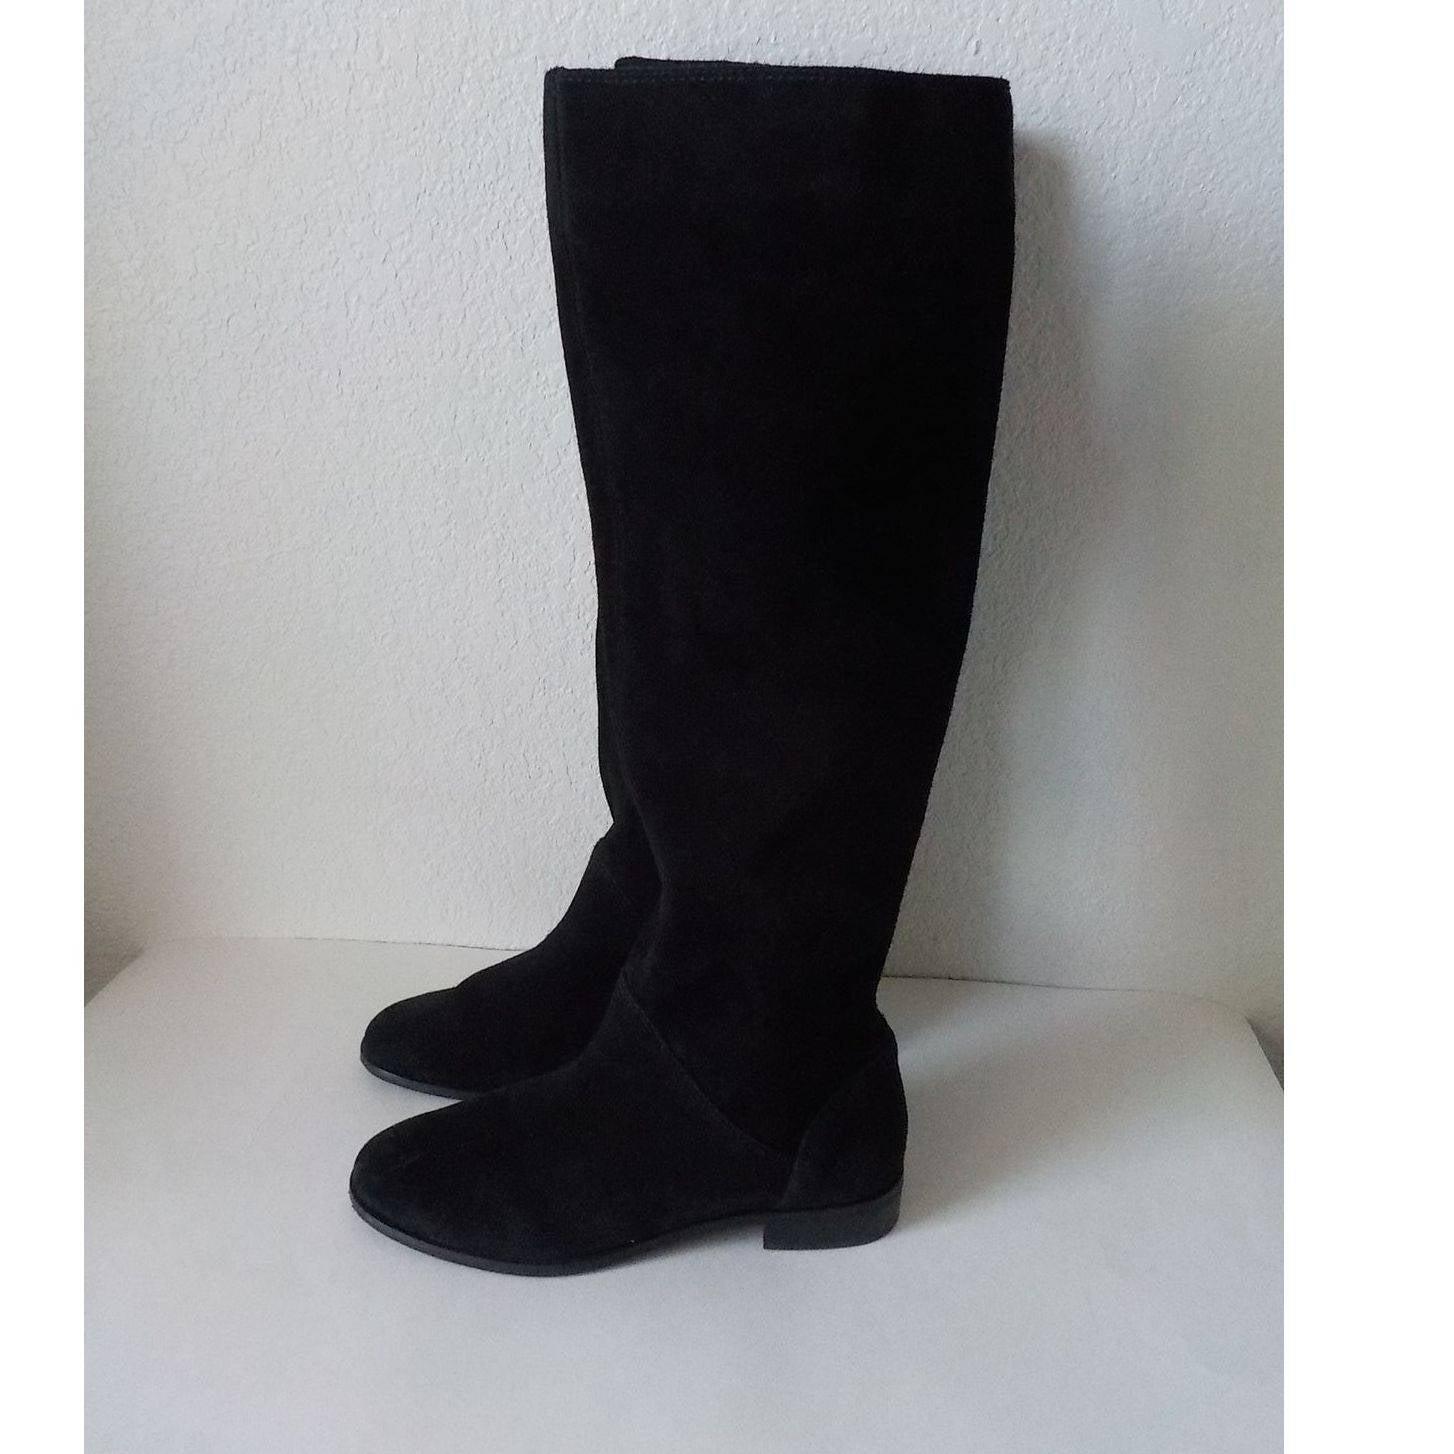 Gianni Bini Knee Boots 9M Suede Black